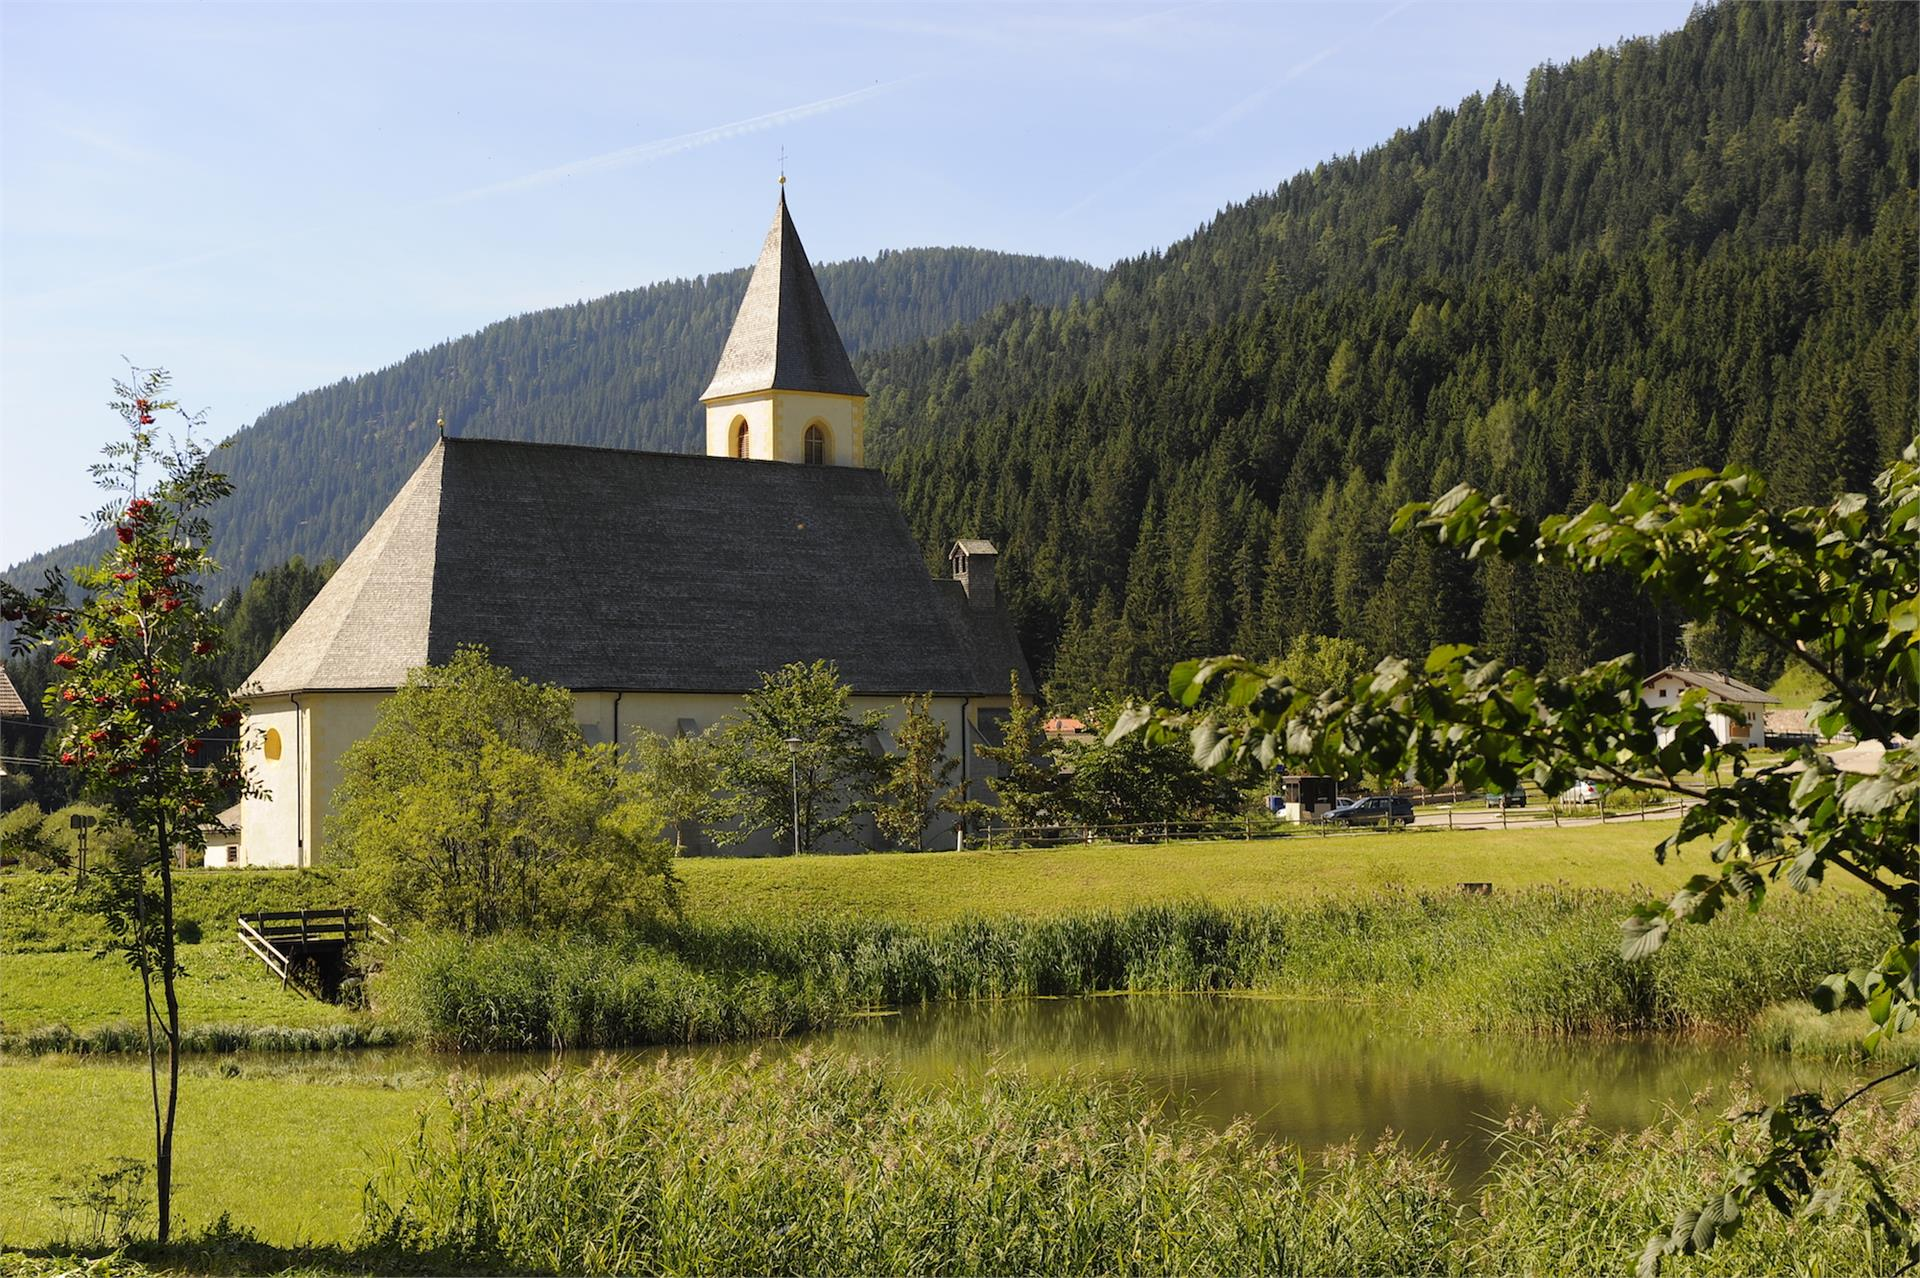 Santuario di Senale